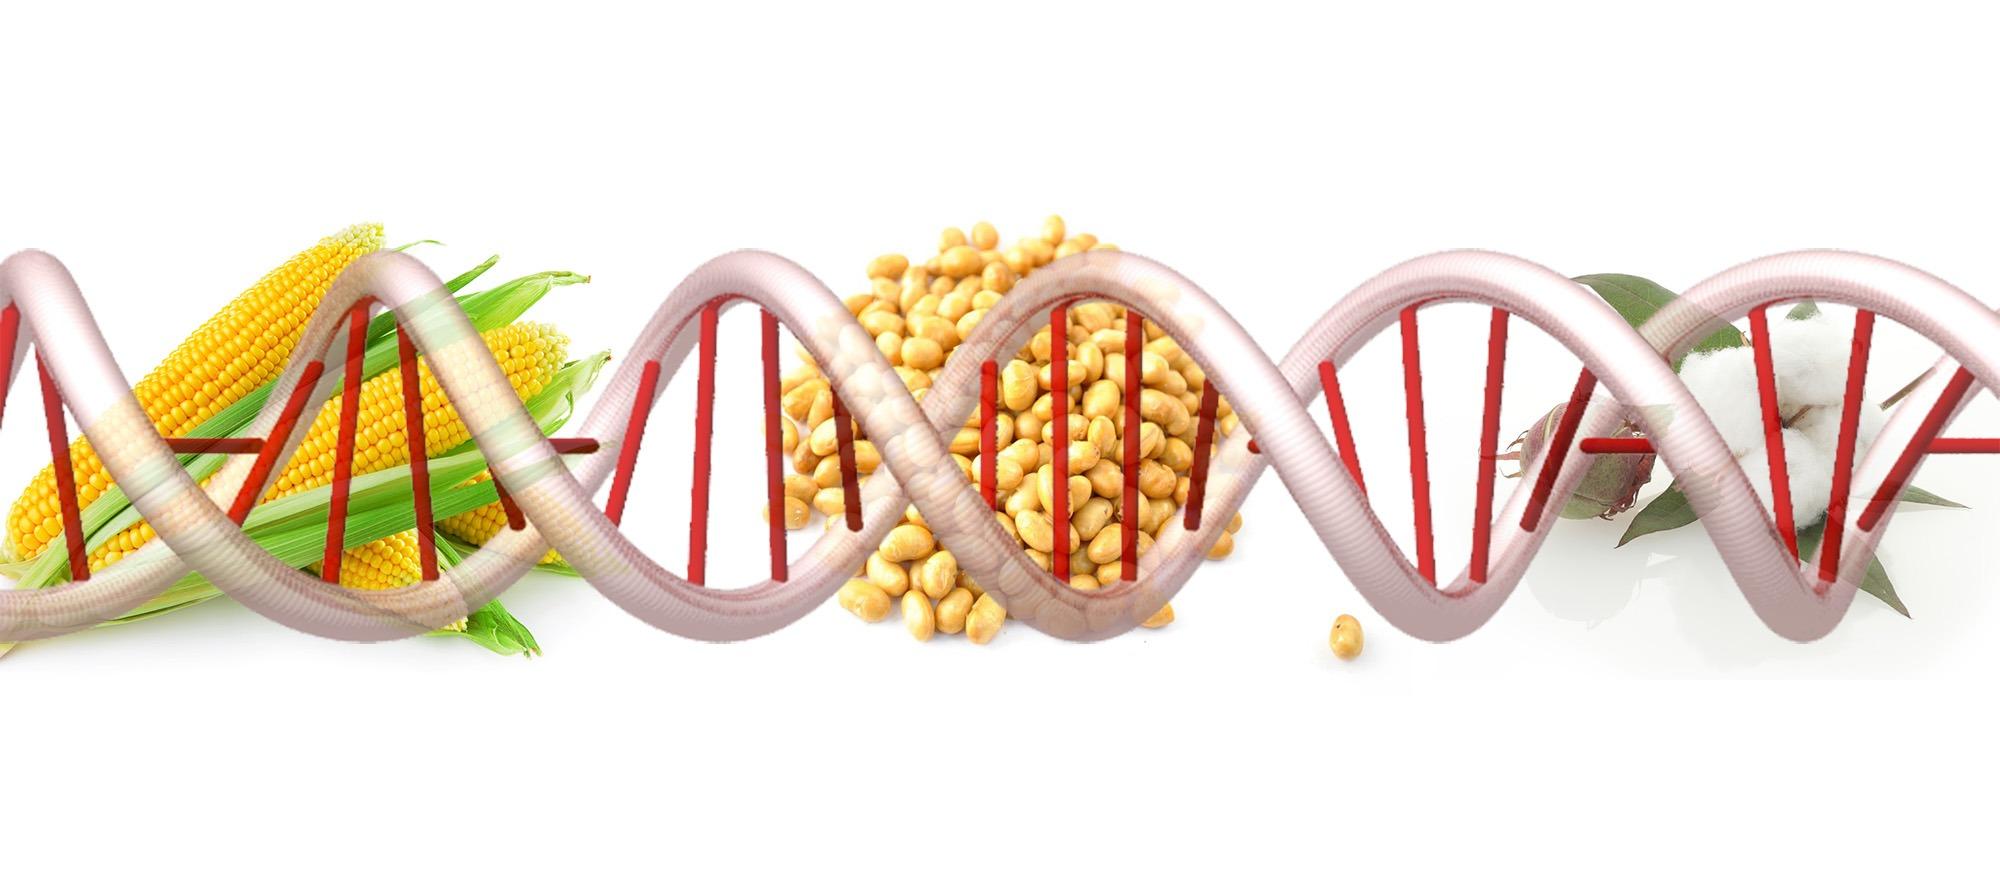 https://www.emaze.com/@AIZFIFZI/GMOs